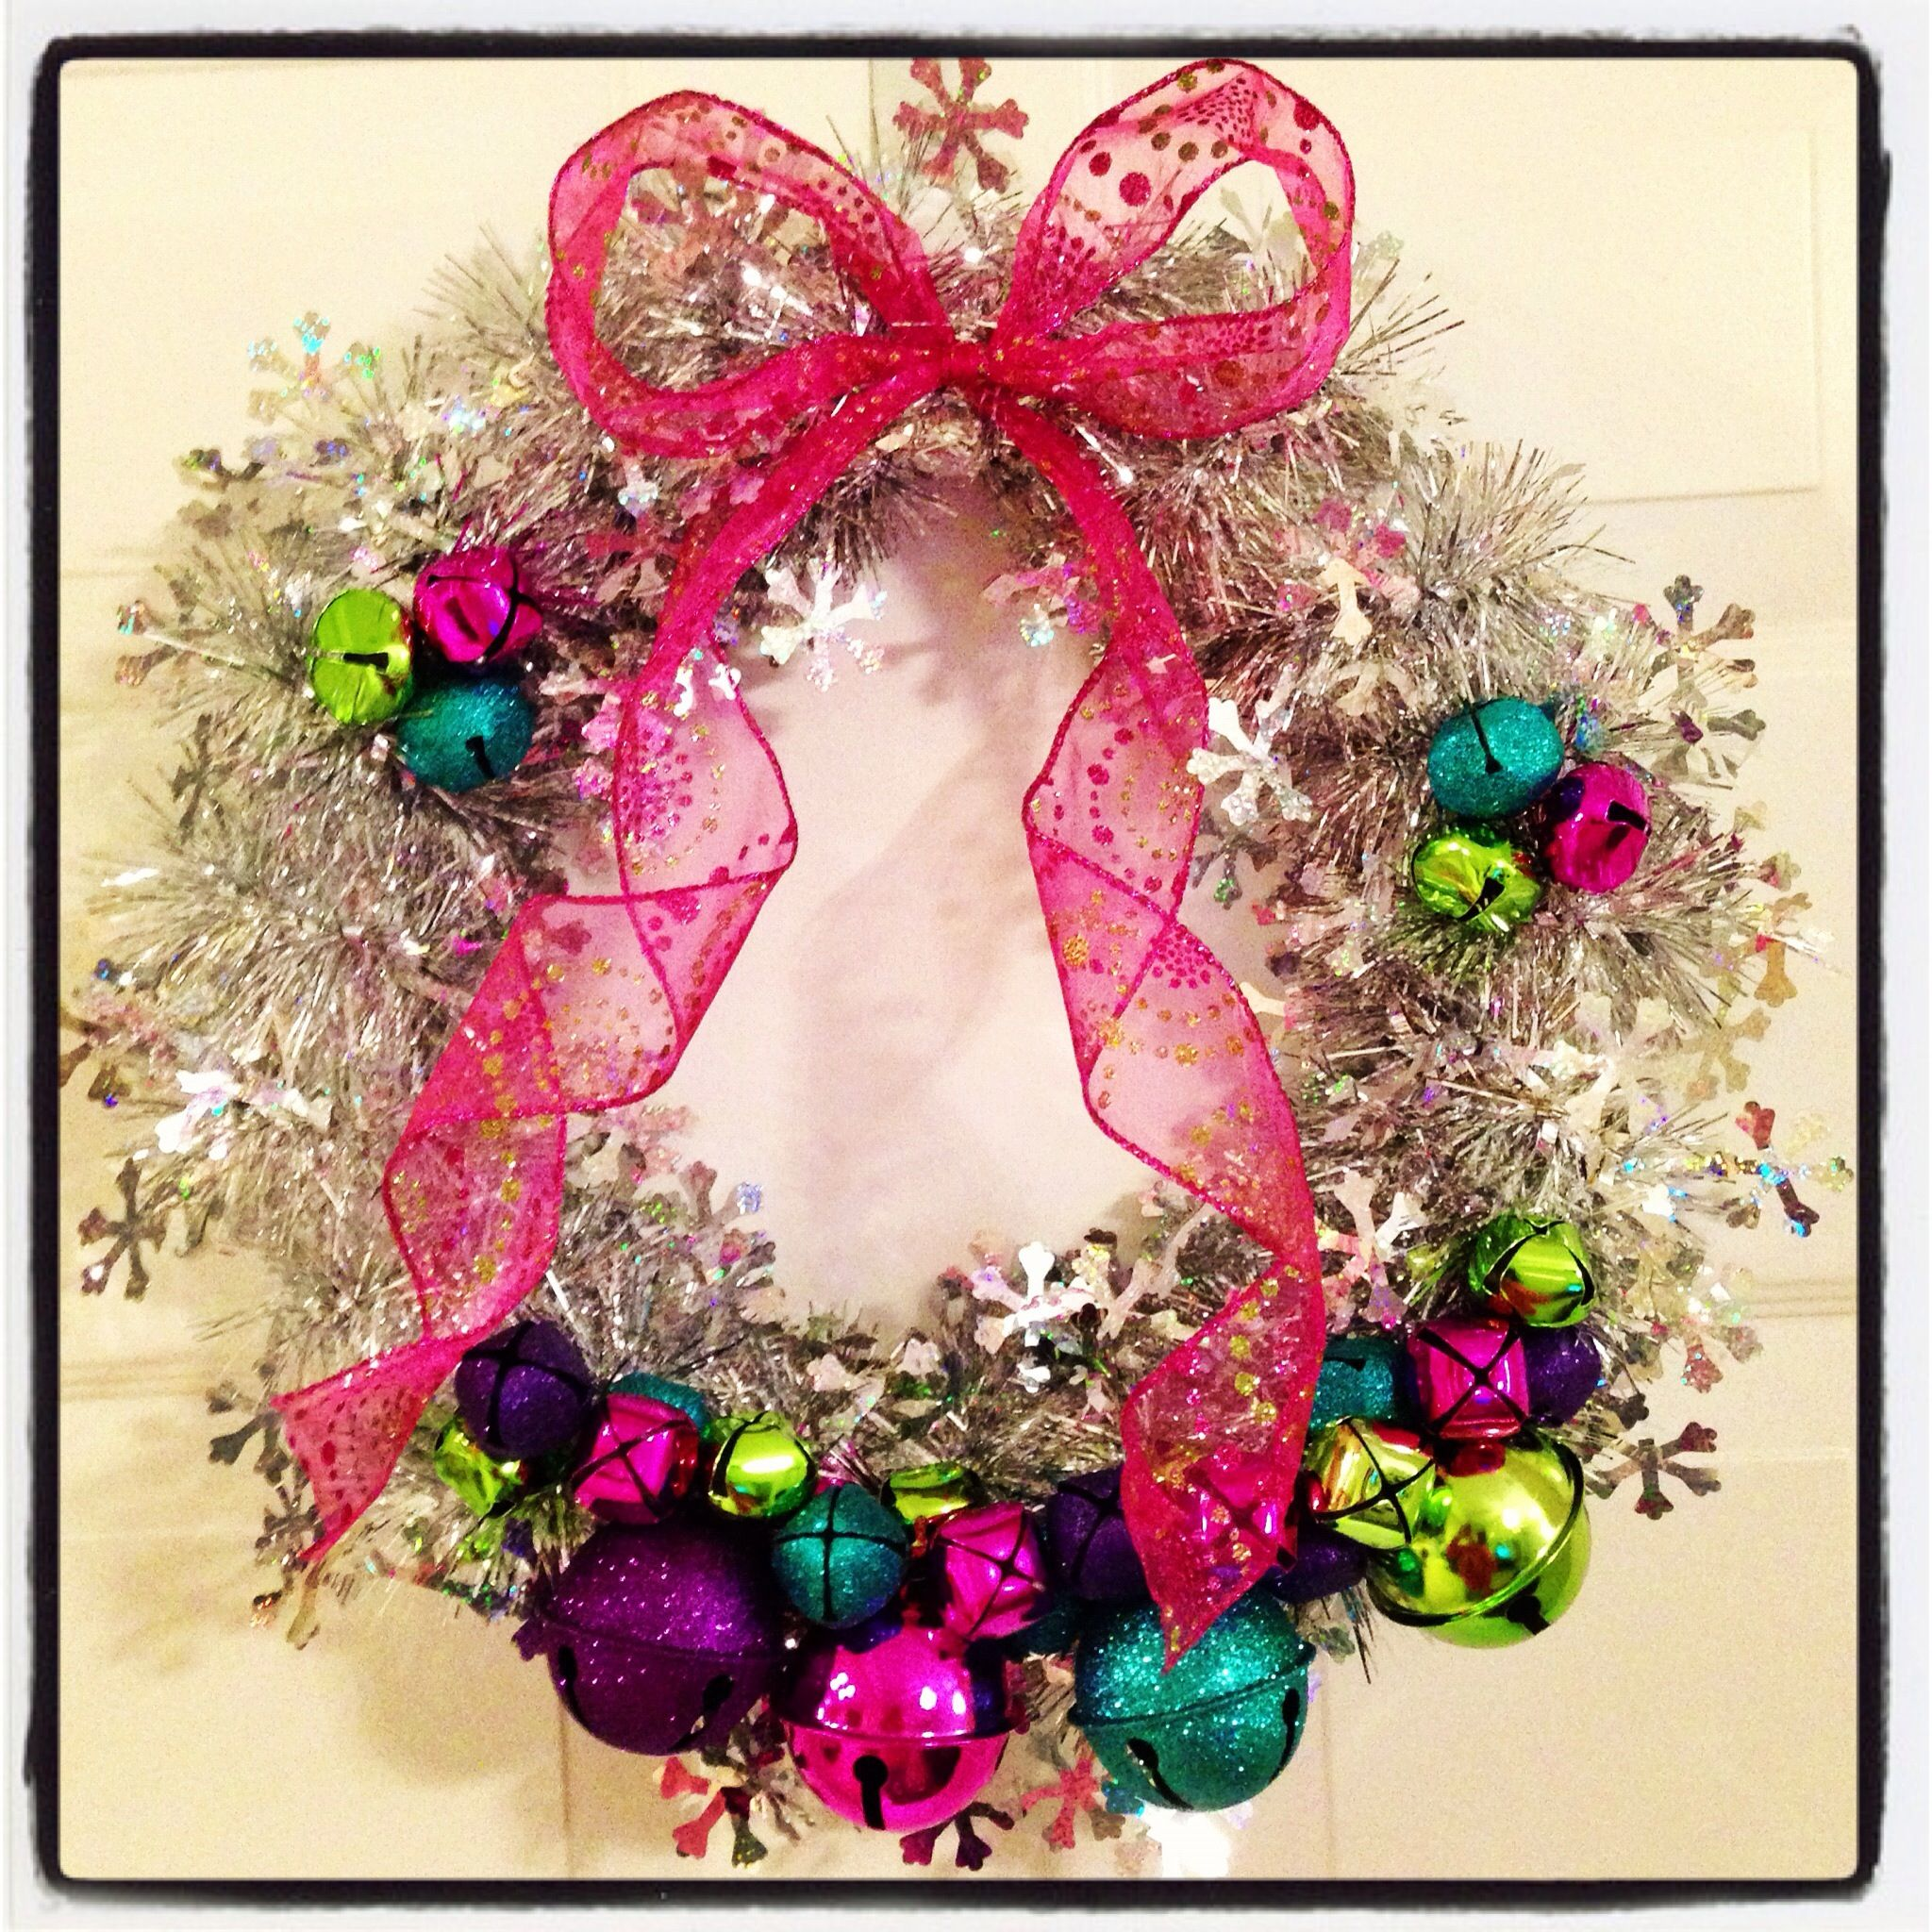 Wreath I made! Bells and tinsel garland Christmas